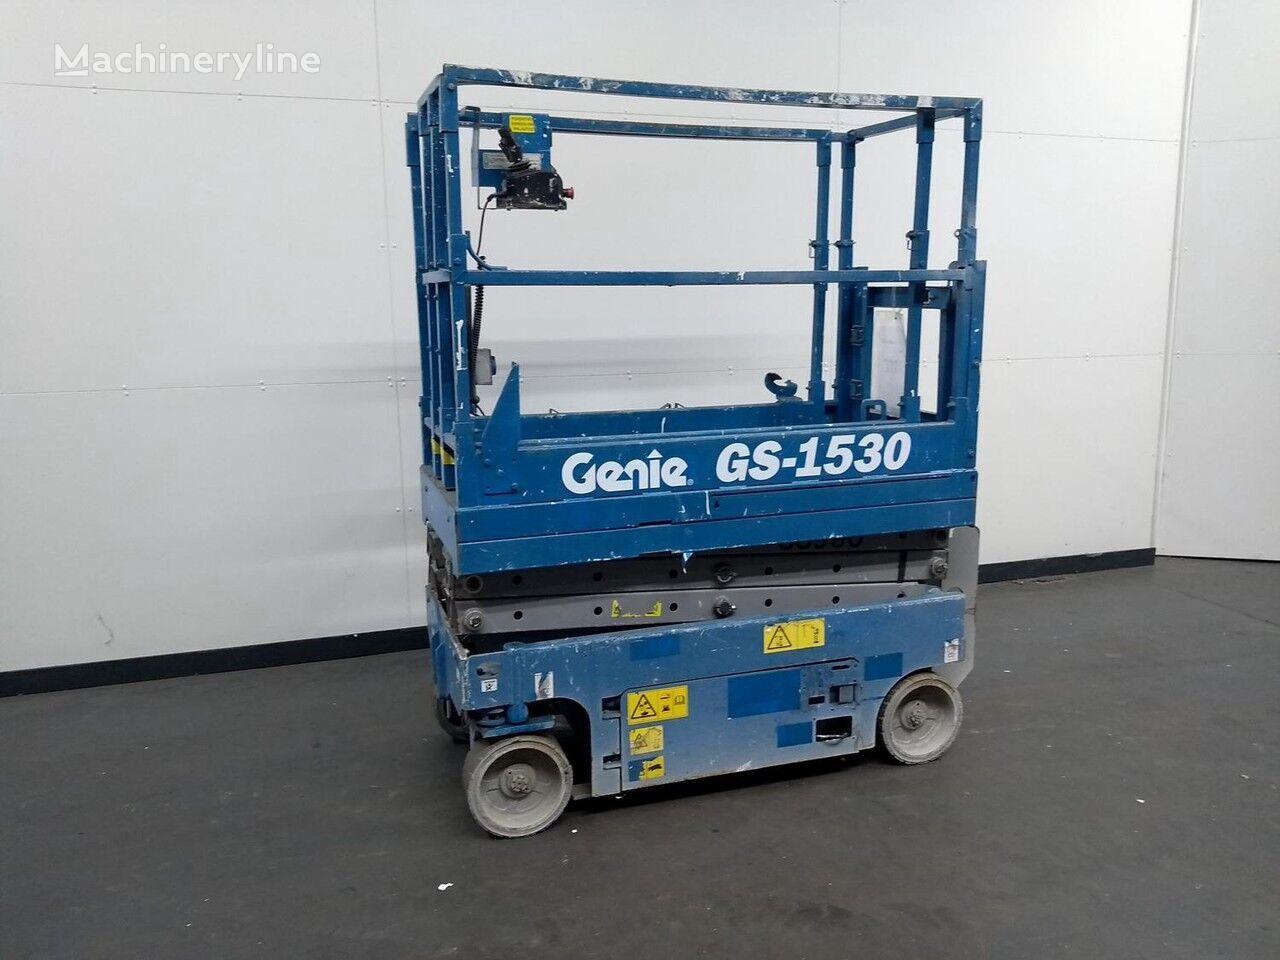 GENIE GS-1530 schaarhoogwerker